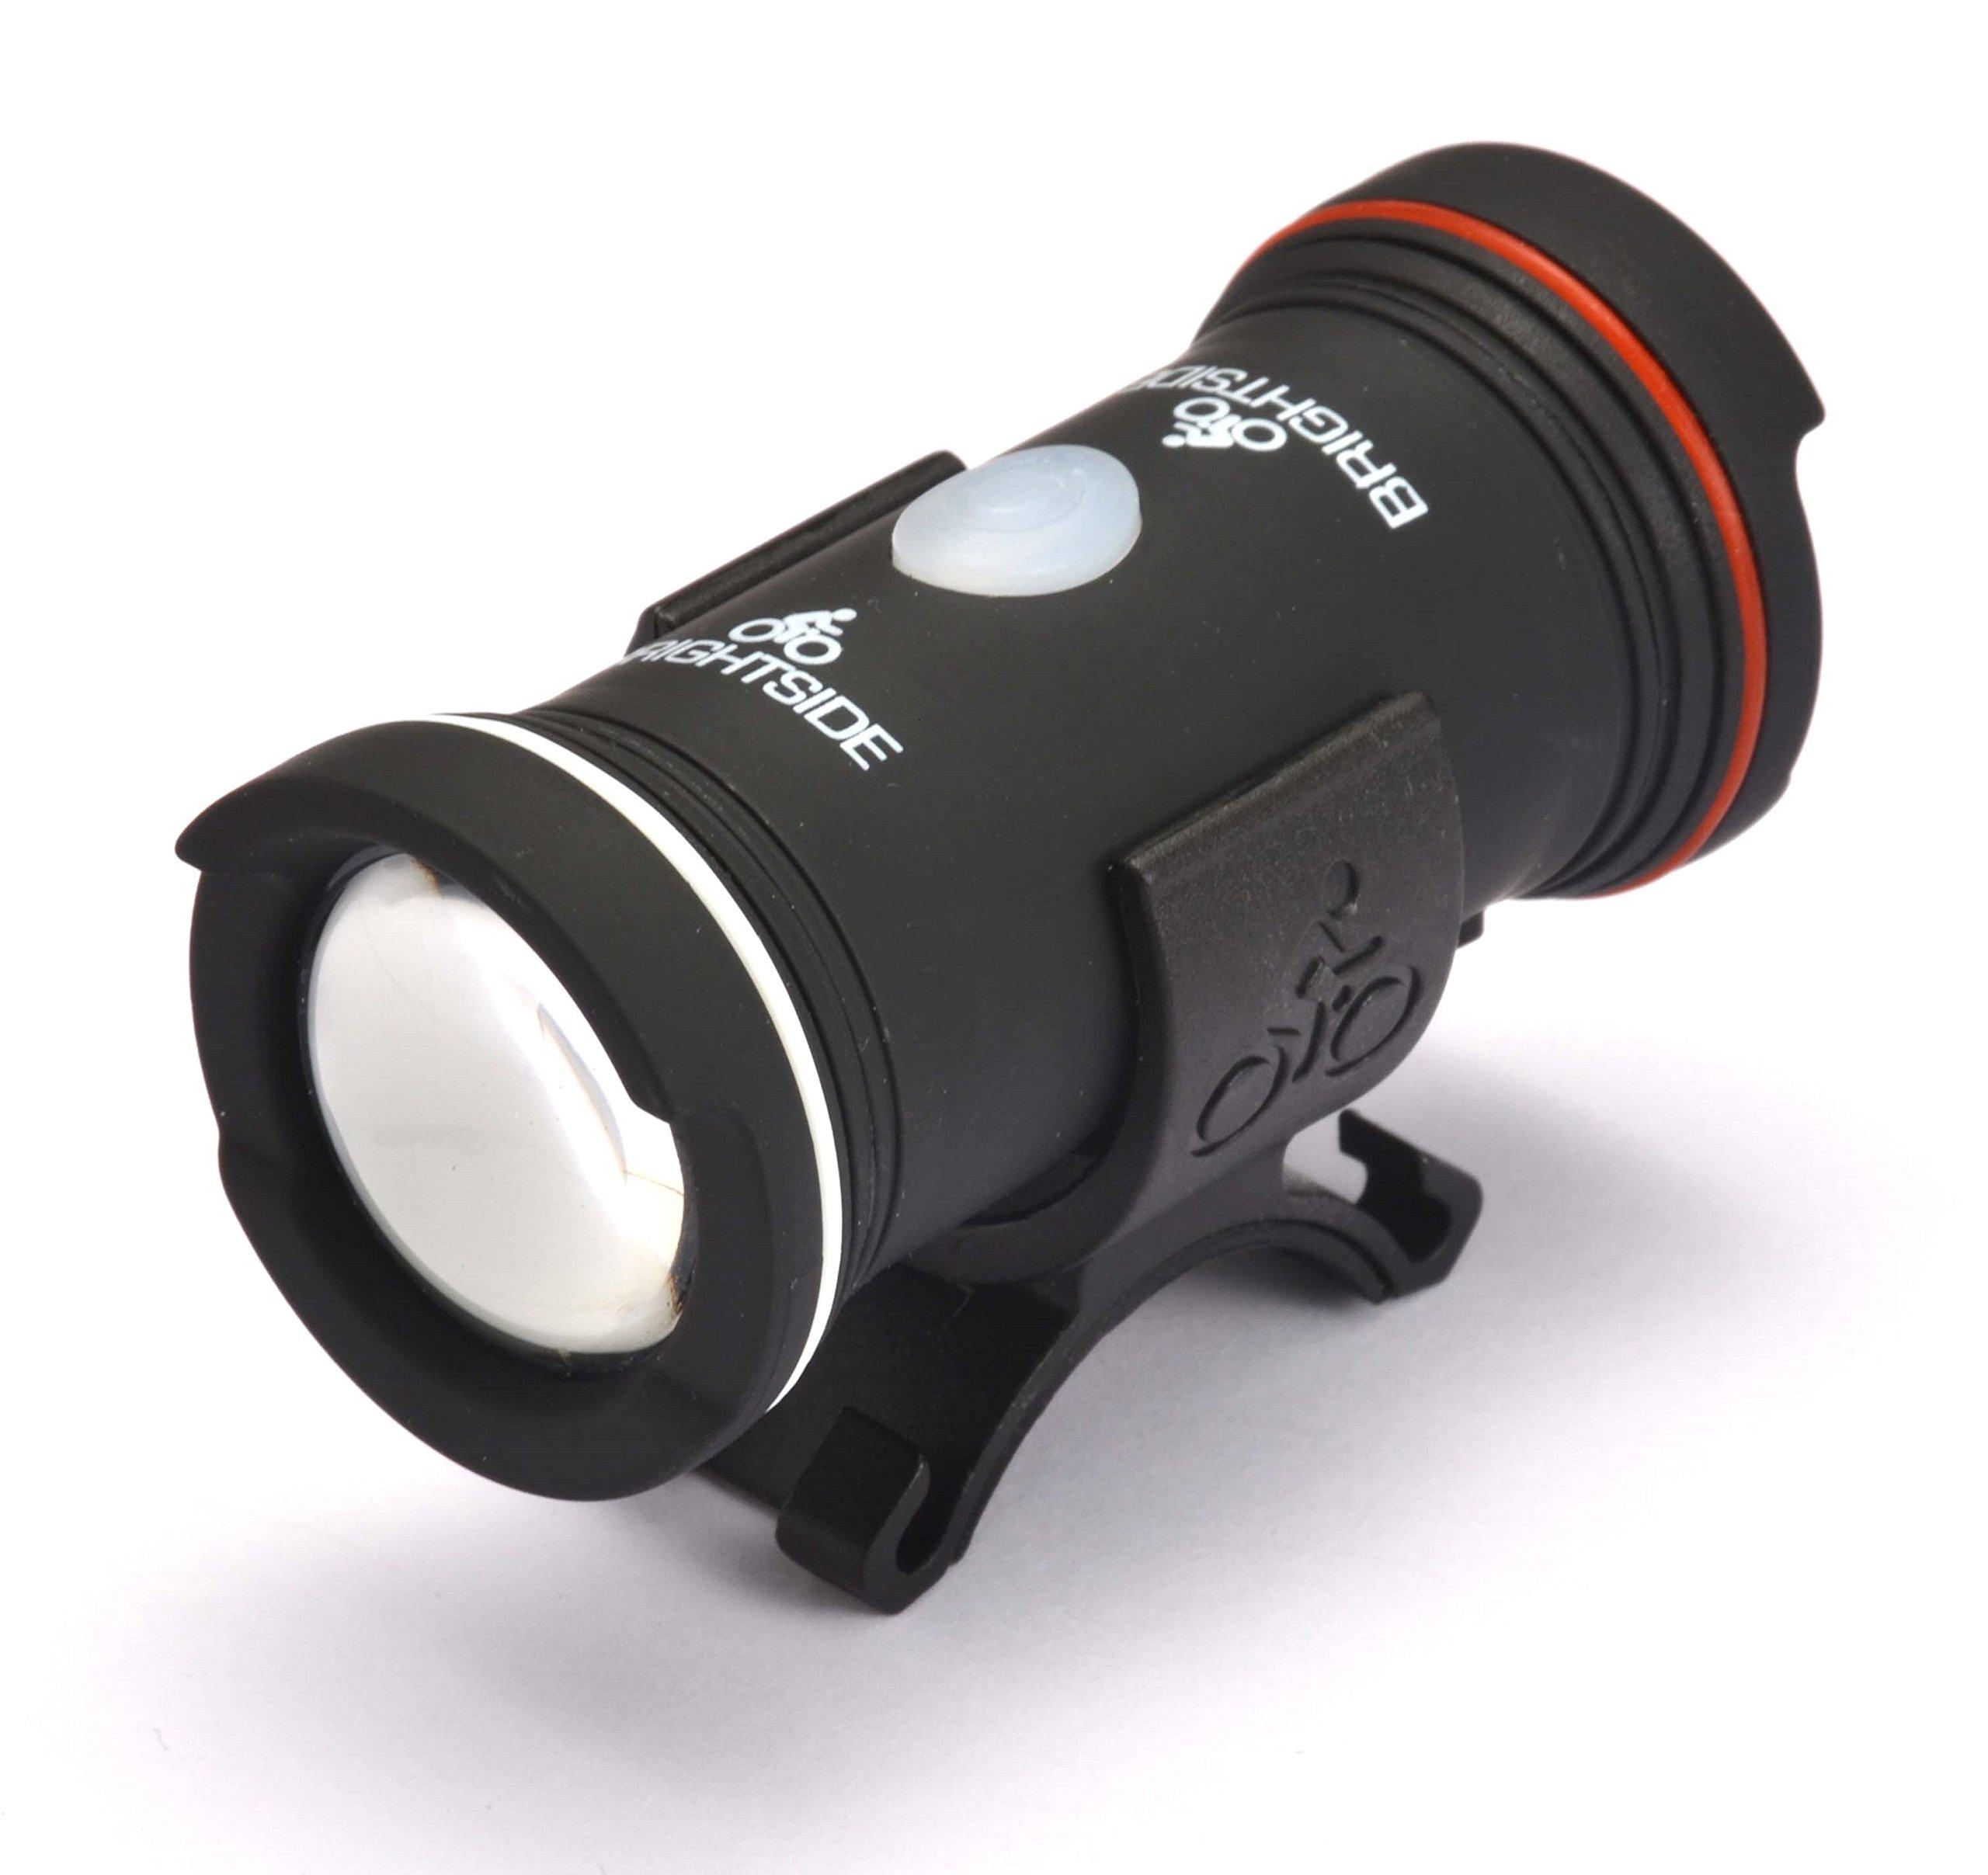 Topside Bike Helmet Light. Rechargeable Cycling Headlight & Tail Light. Same Day FREE Worldwide Shipping.